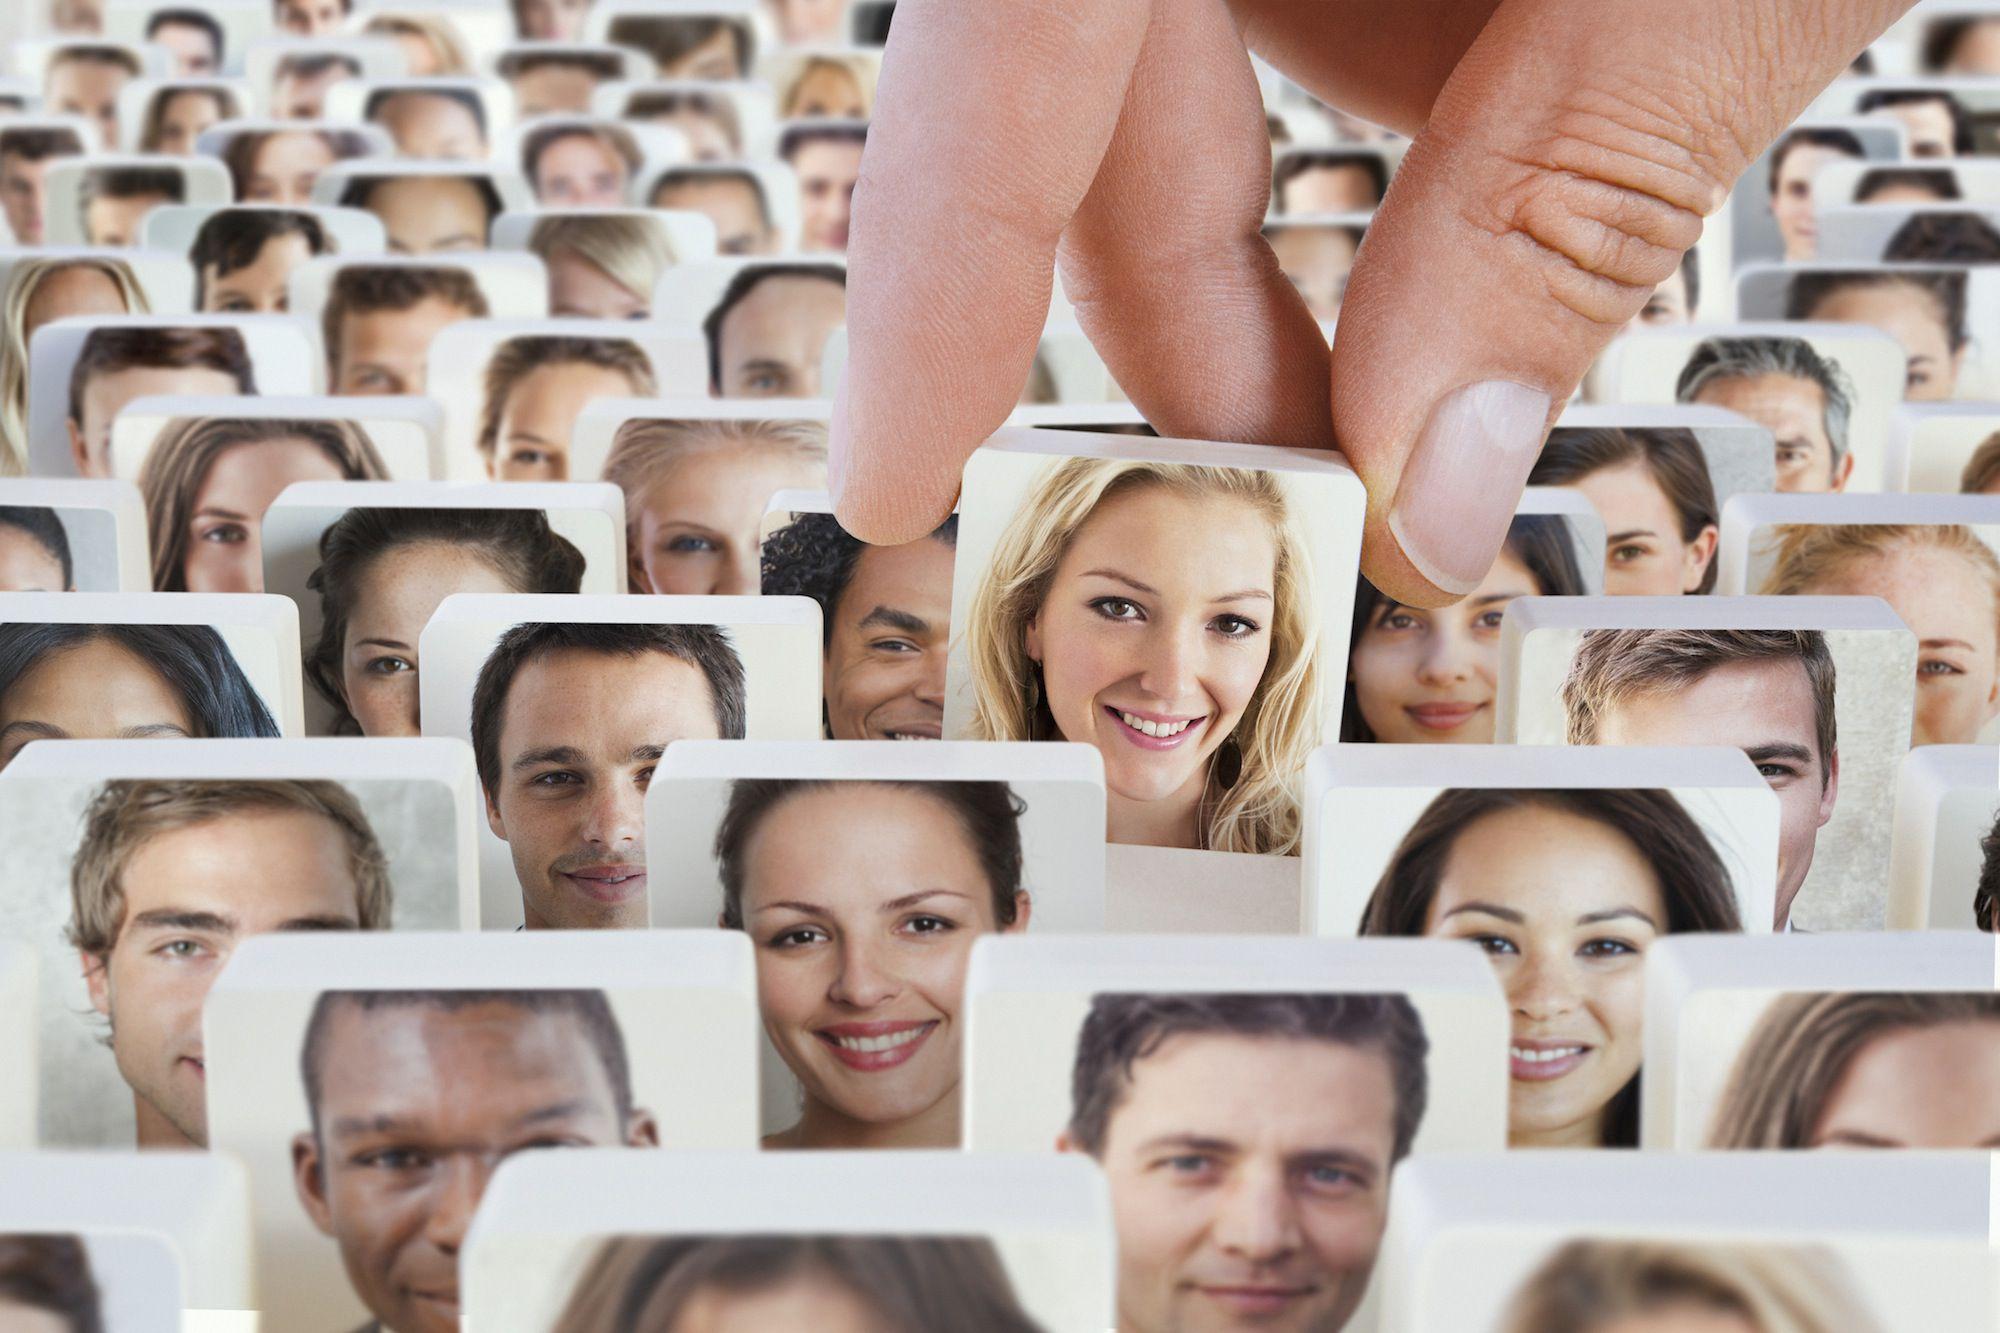 bibelske dating råd online dating for smarte singler